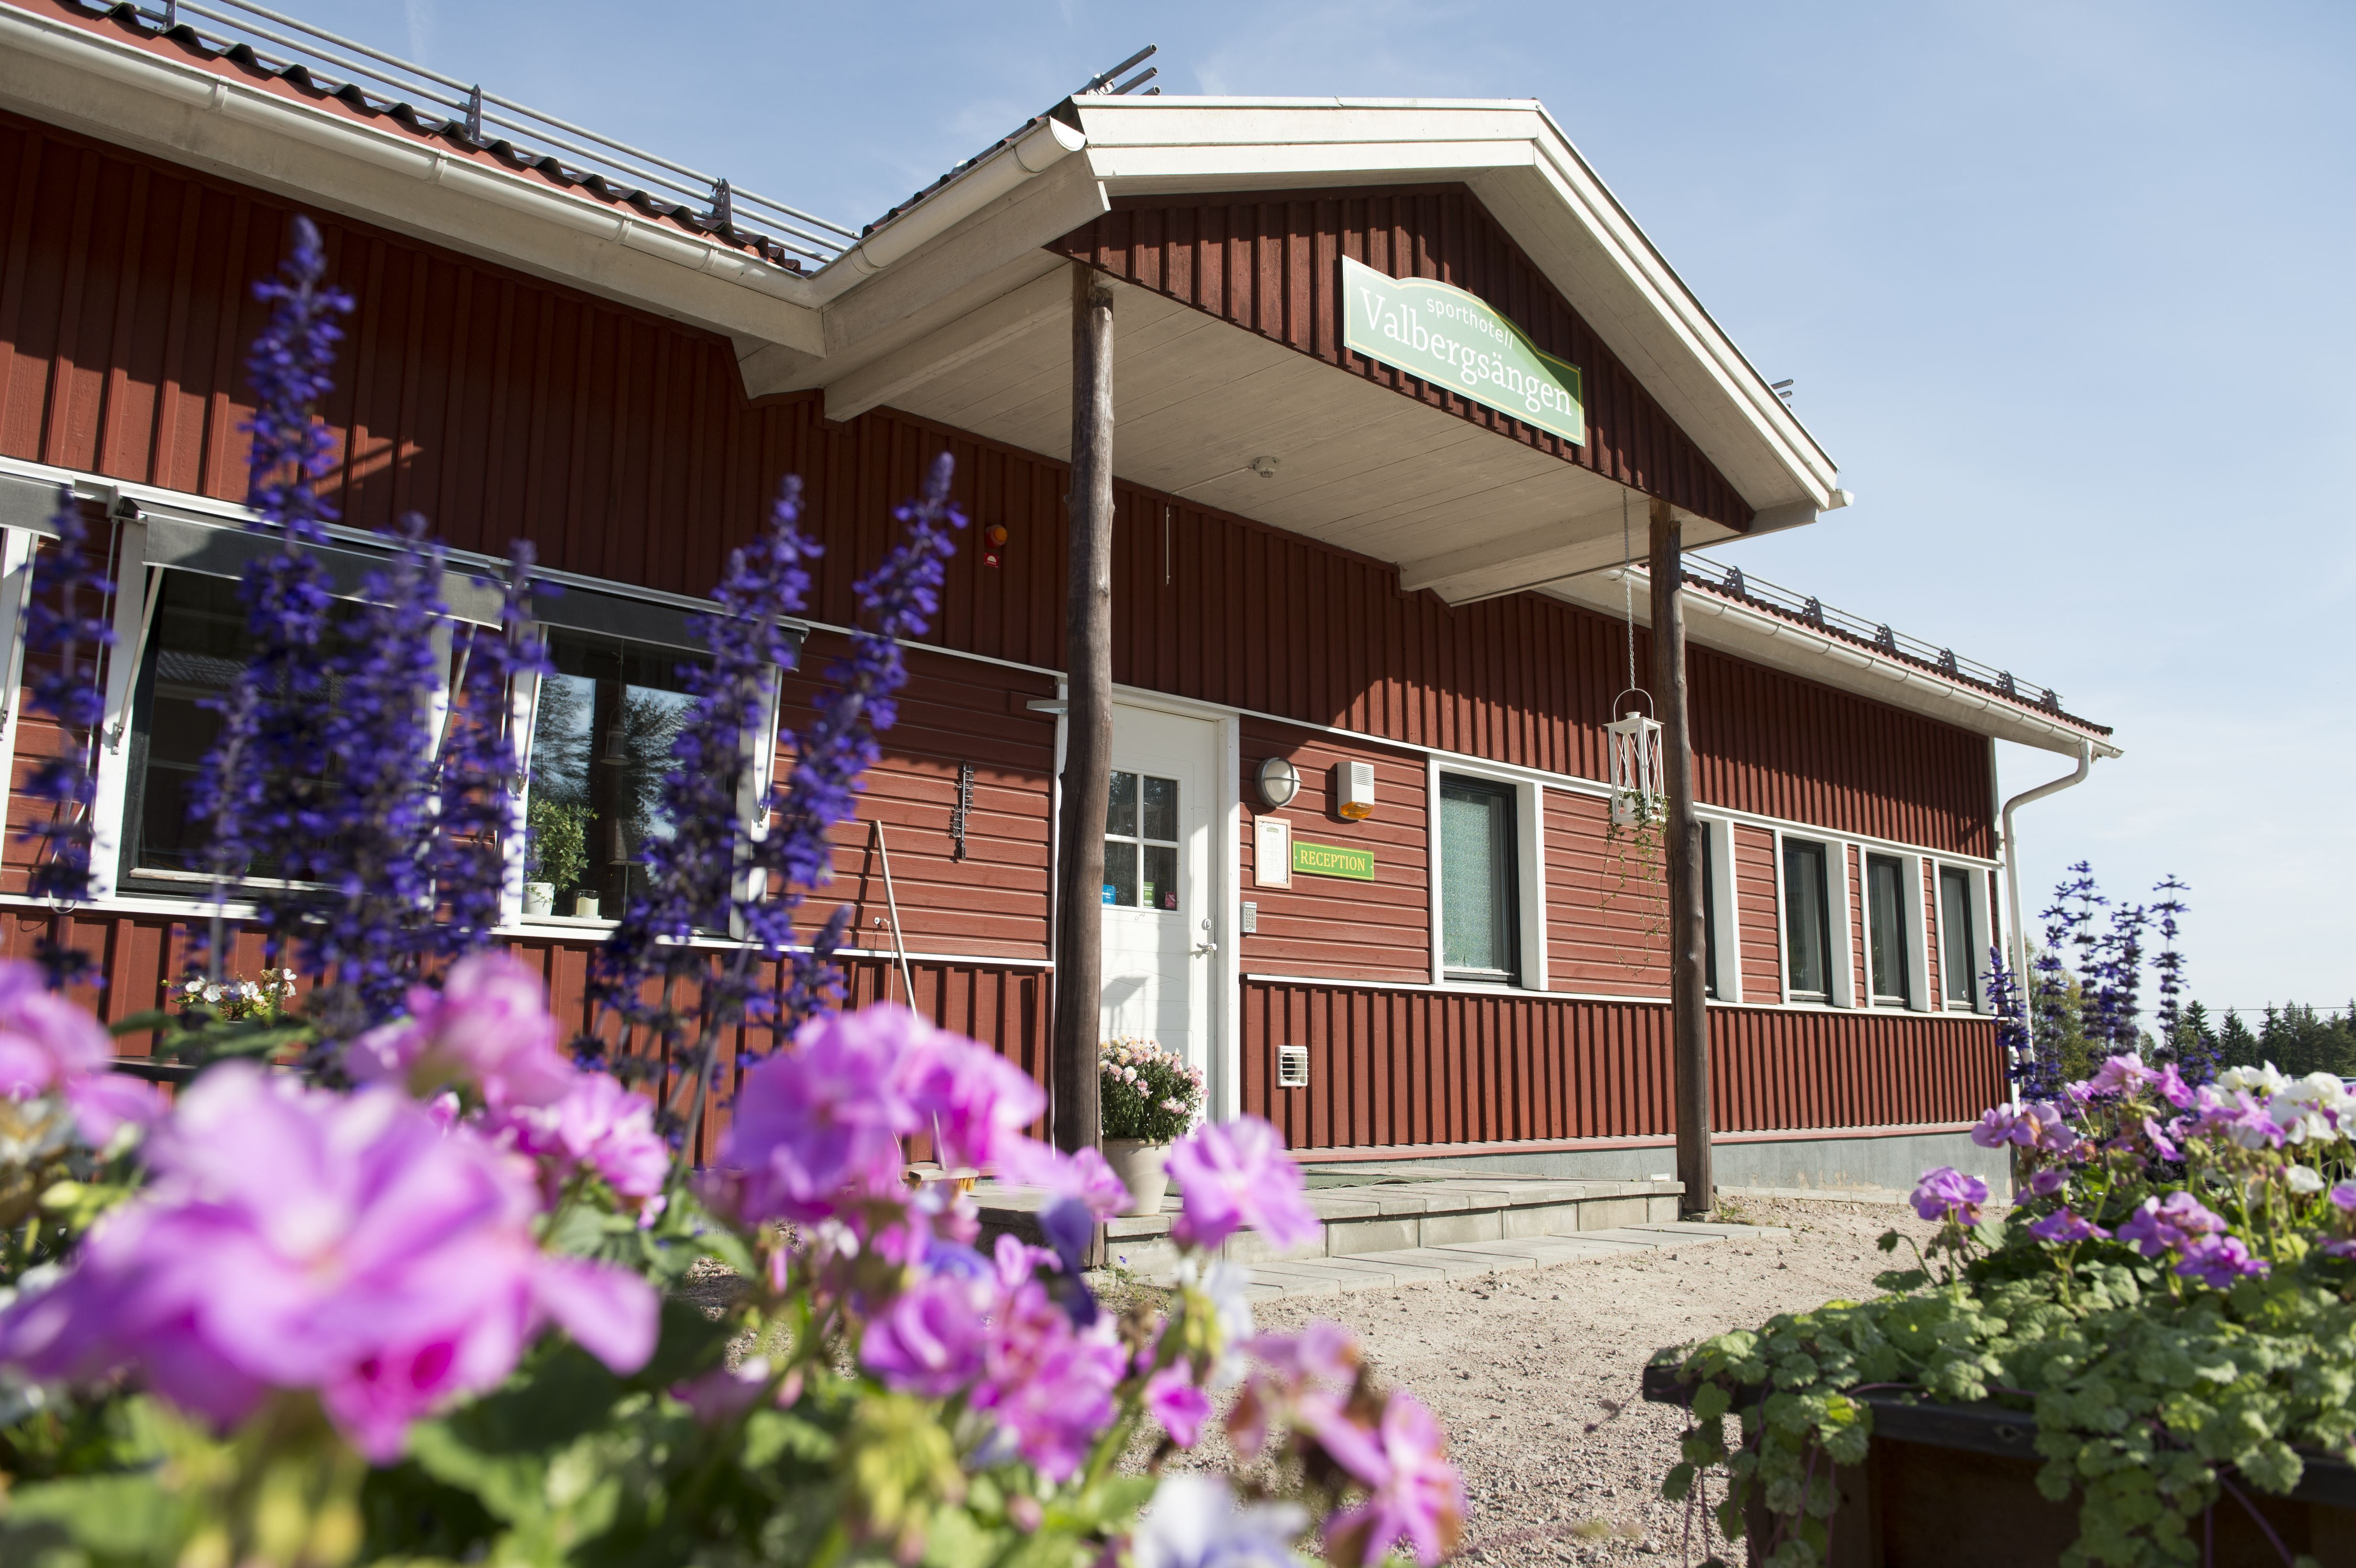 Valbergsängen Sporthotell